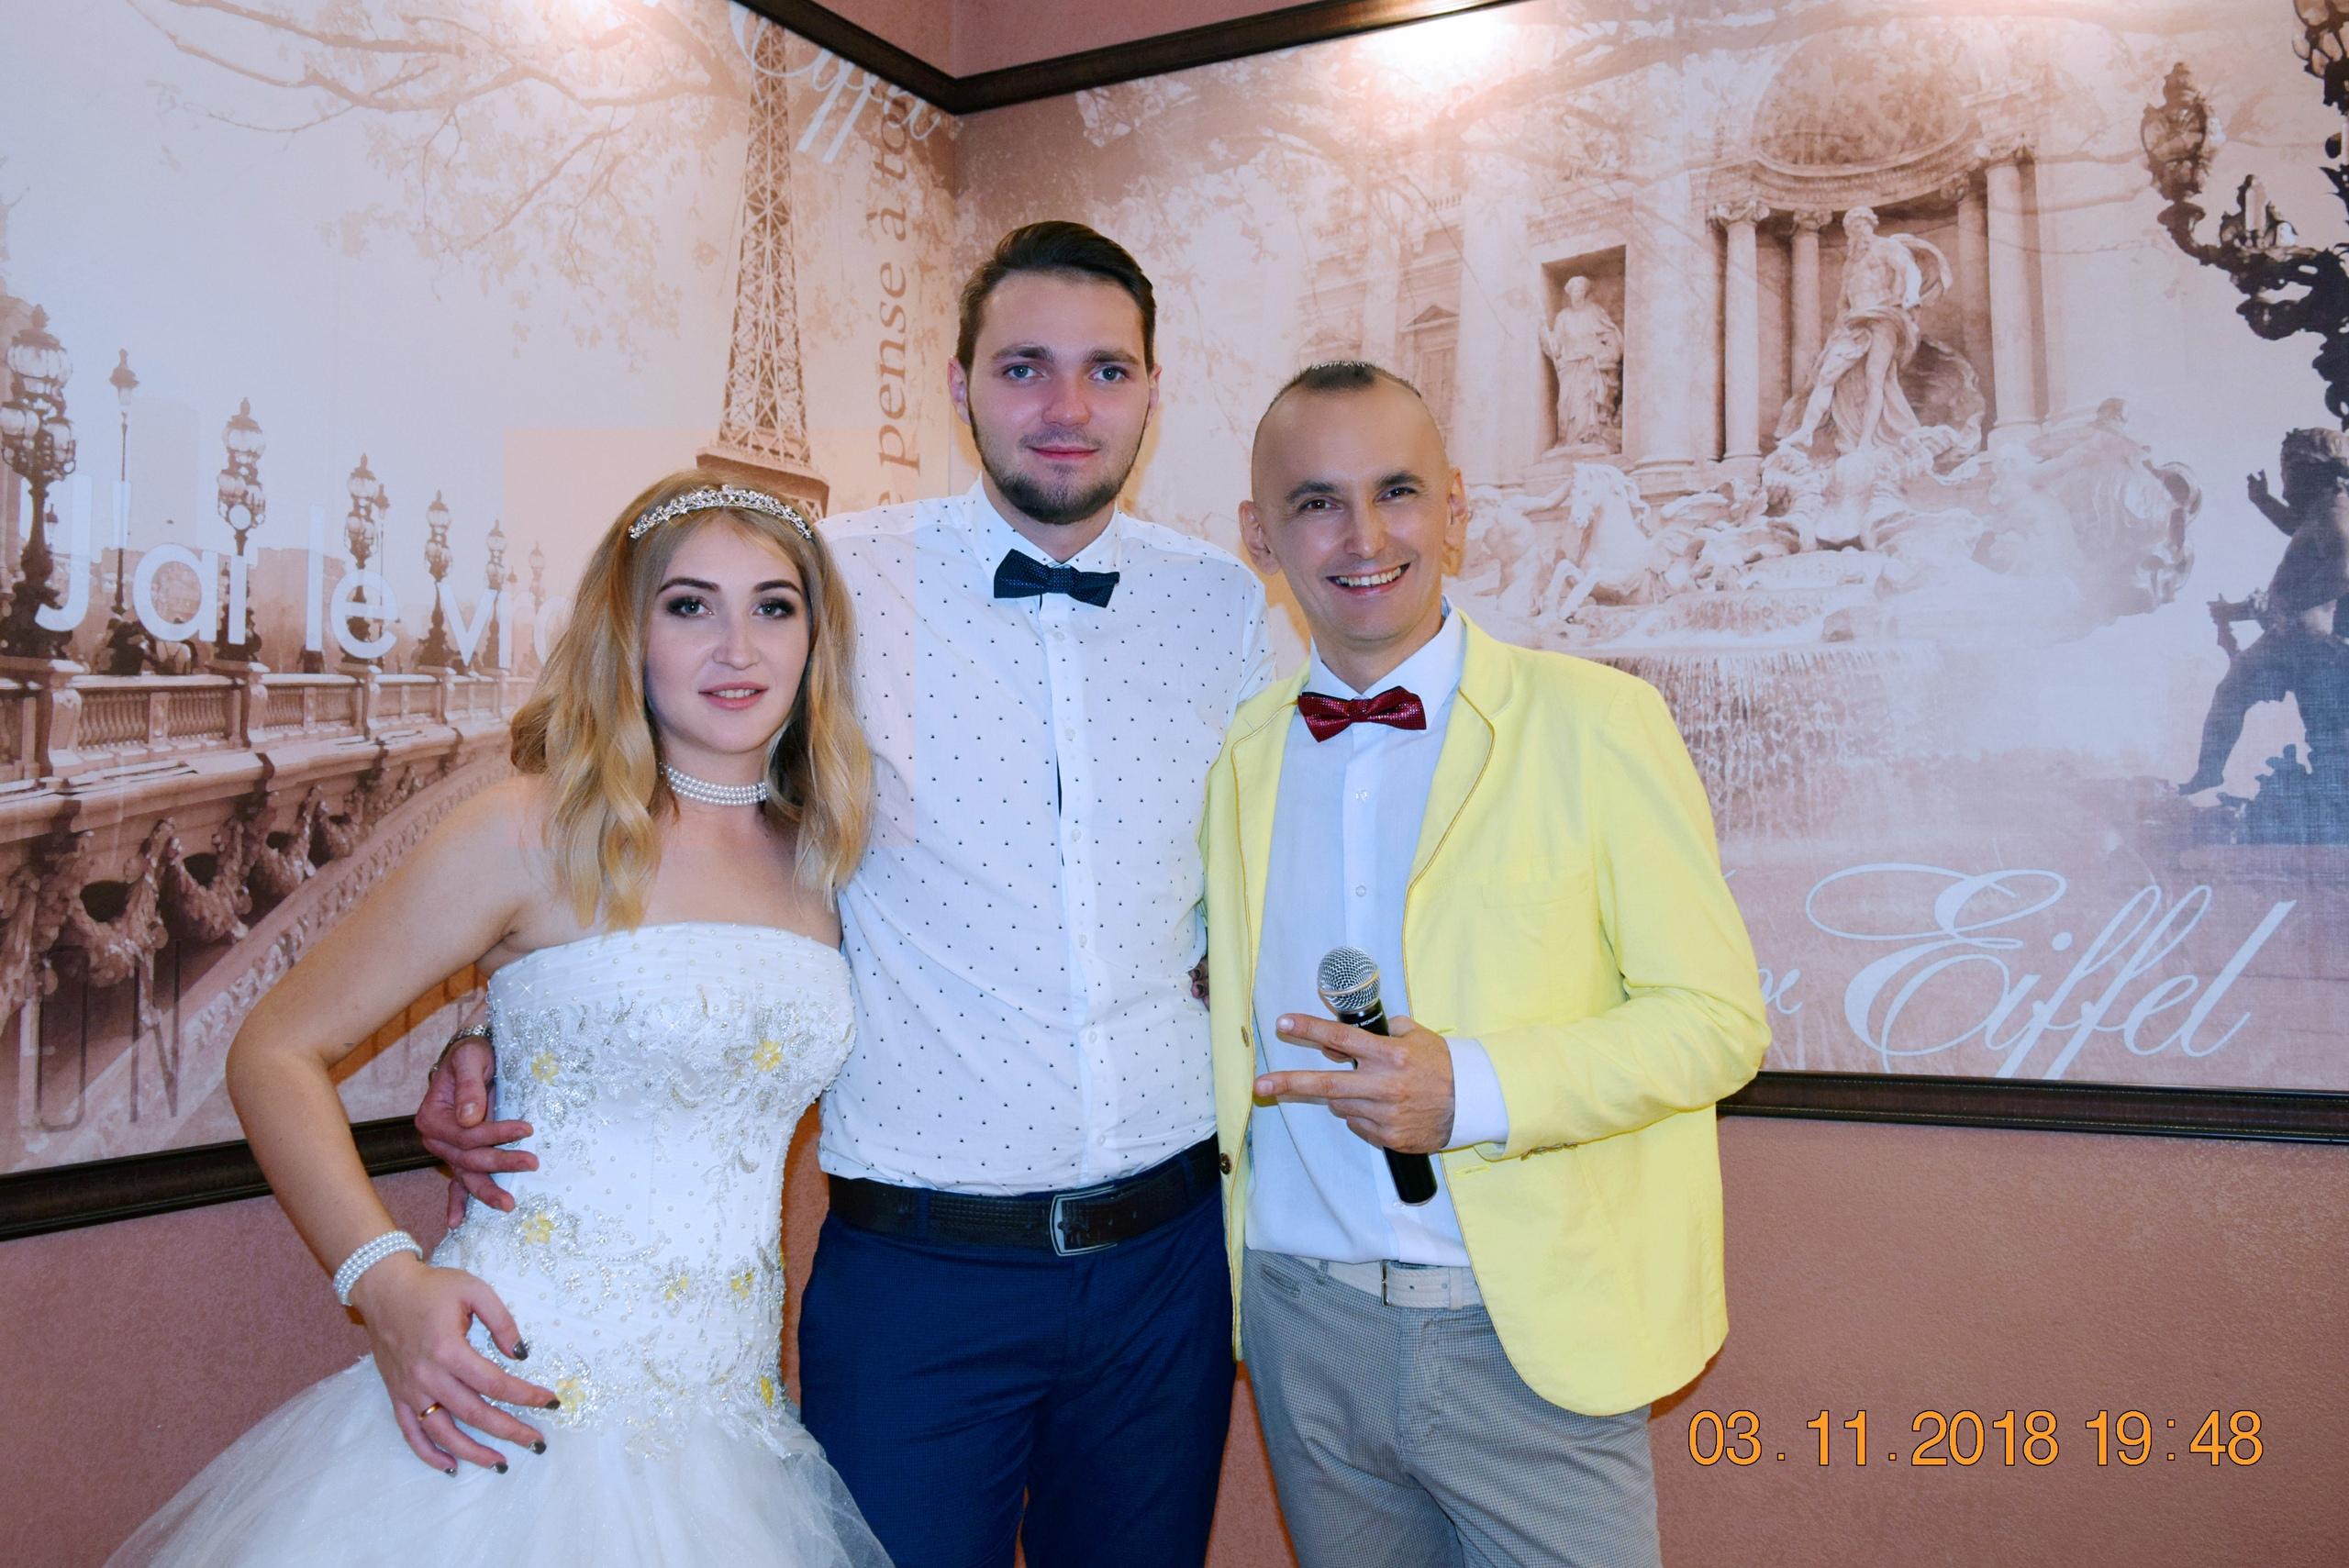 G91DQpoqpBQ - Свадьба Ивана и Натальи